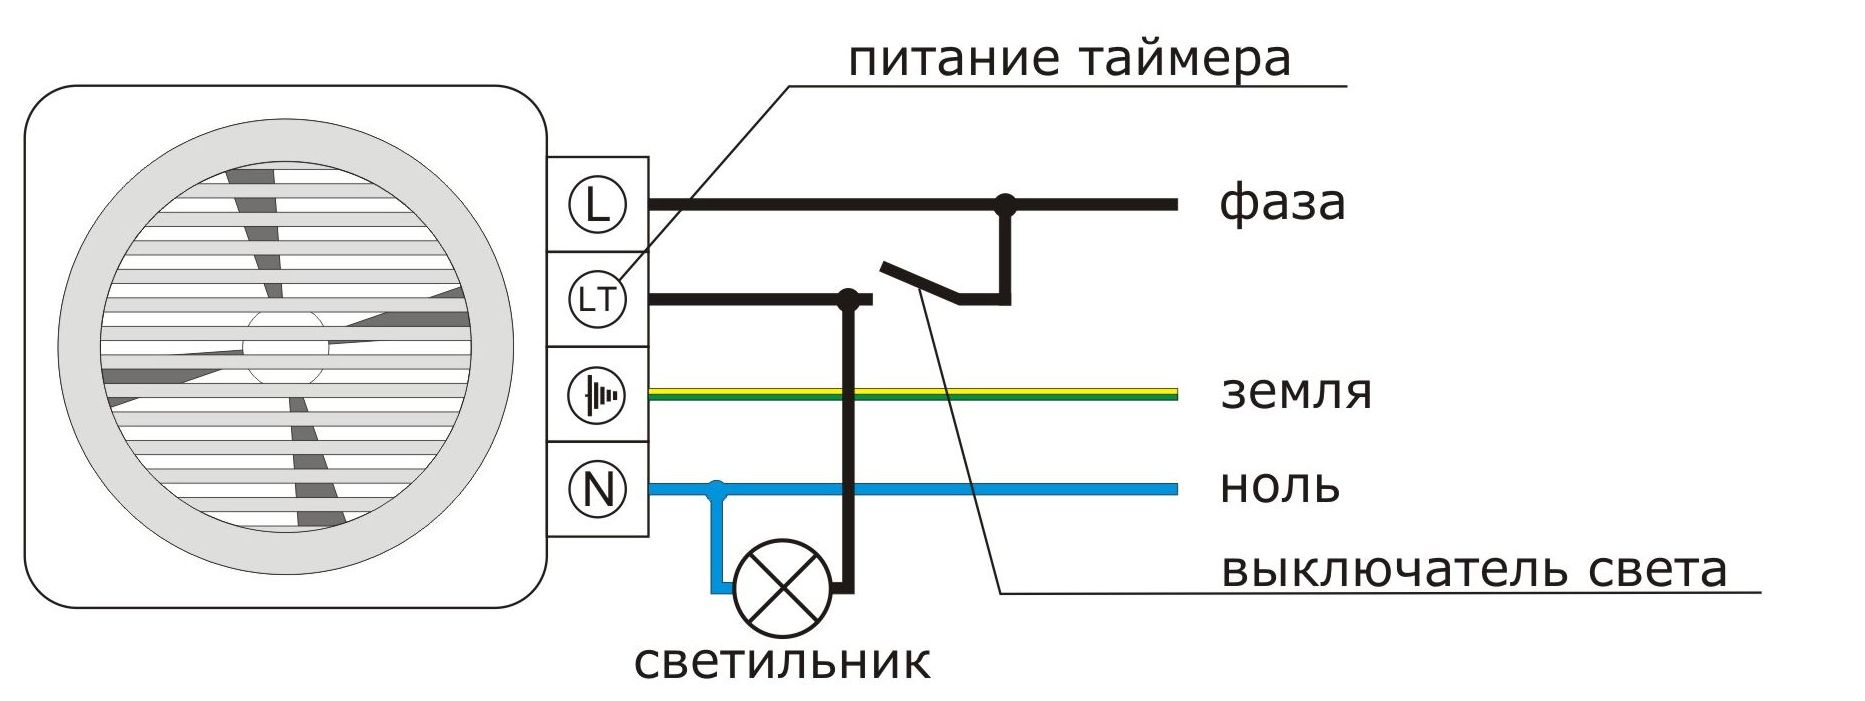 СП 51133302011 Защита от шума Актуализированная